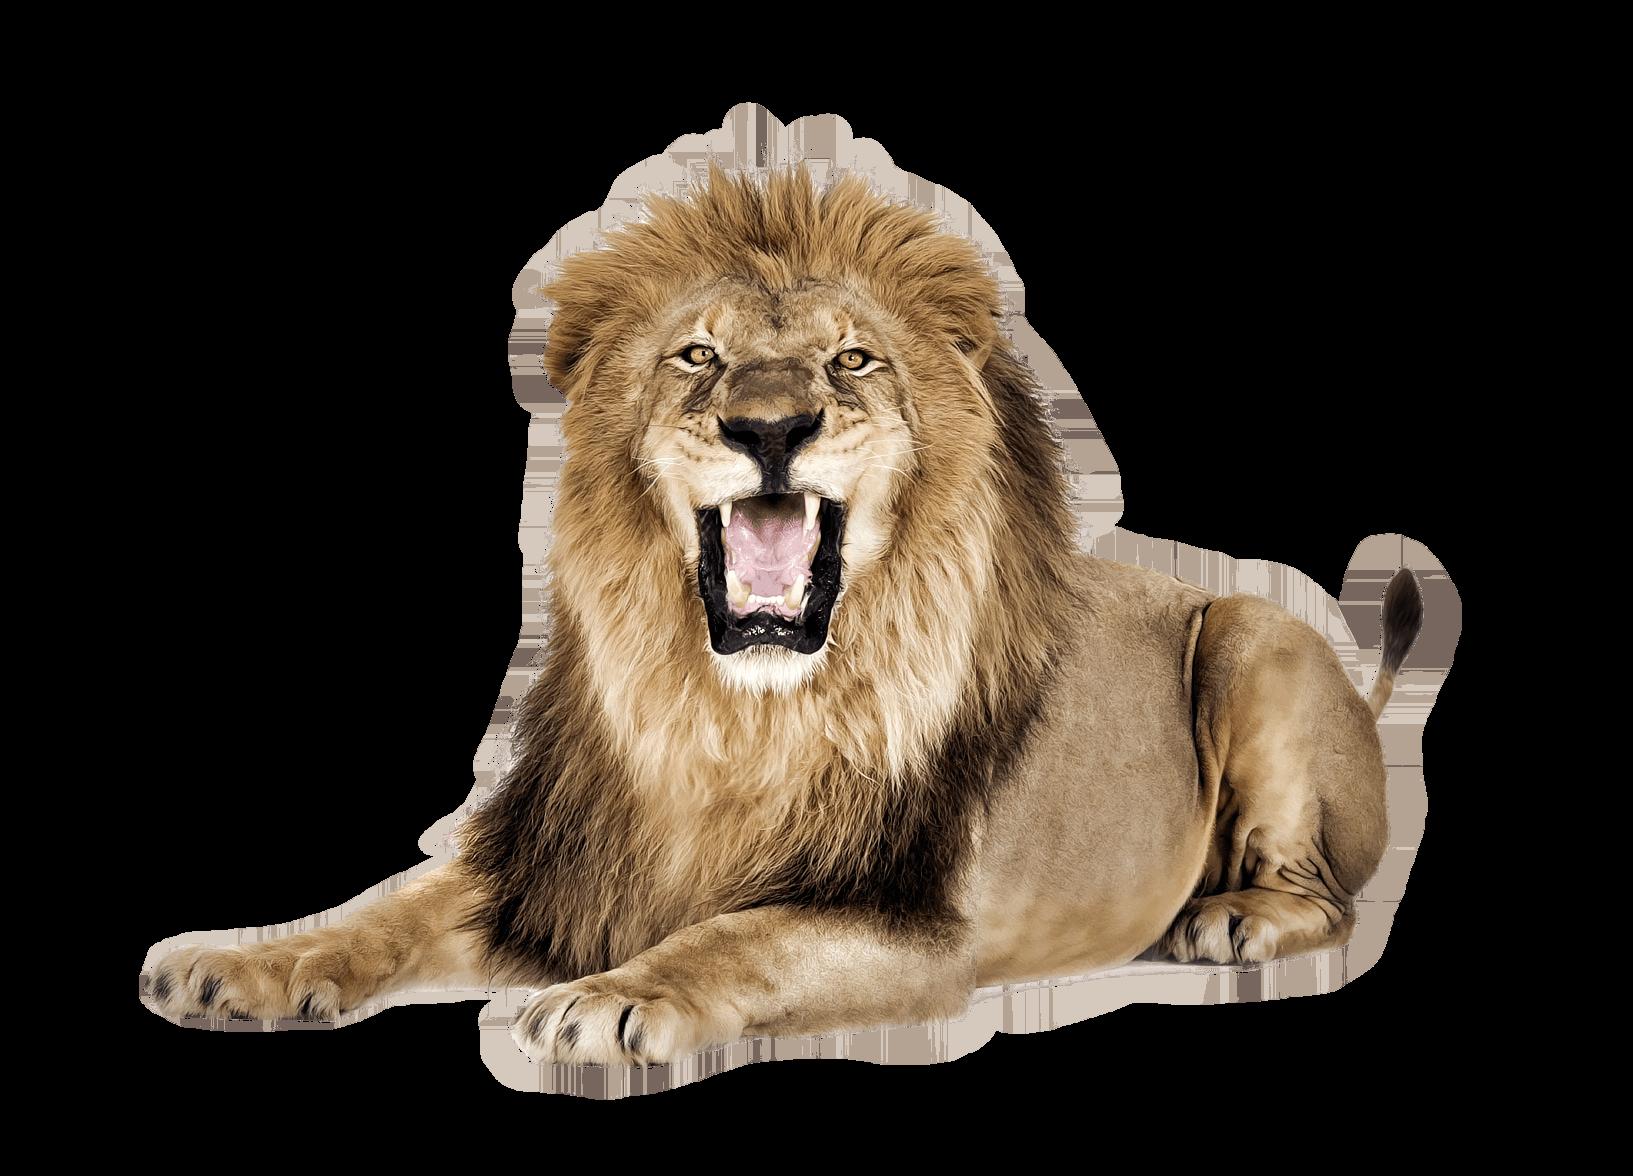 png free download Transparent lion. Roar png stickpng animals